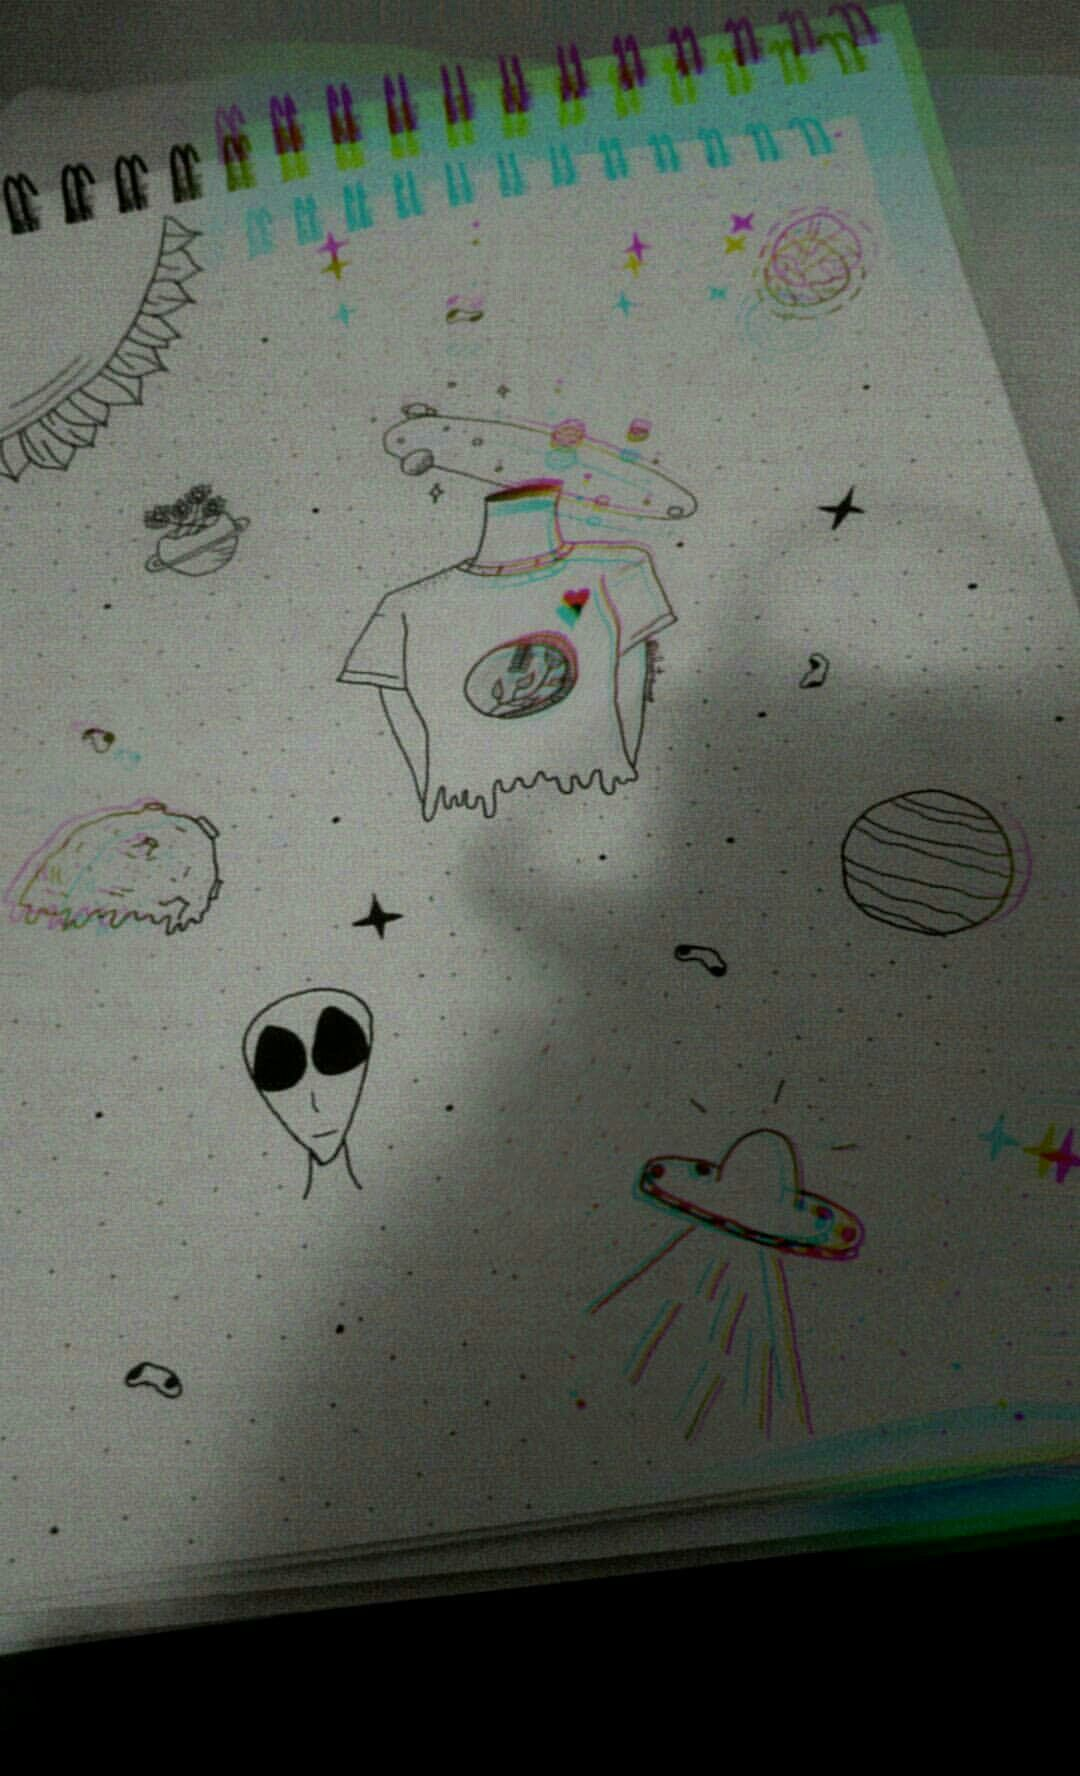 Papel Tumblr Tumblr Ilustracao Illustration Desenho Sketch